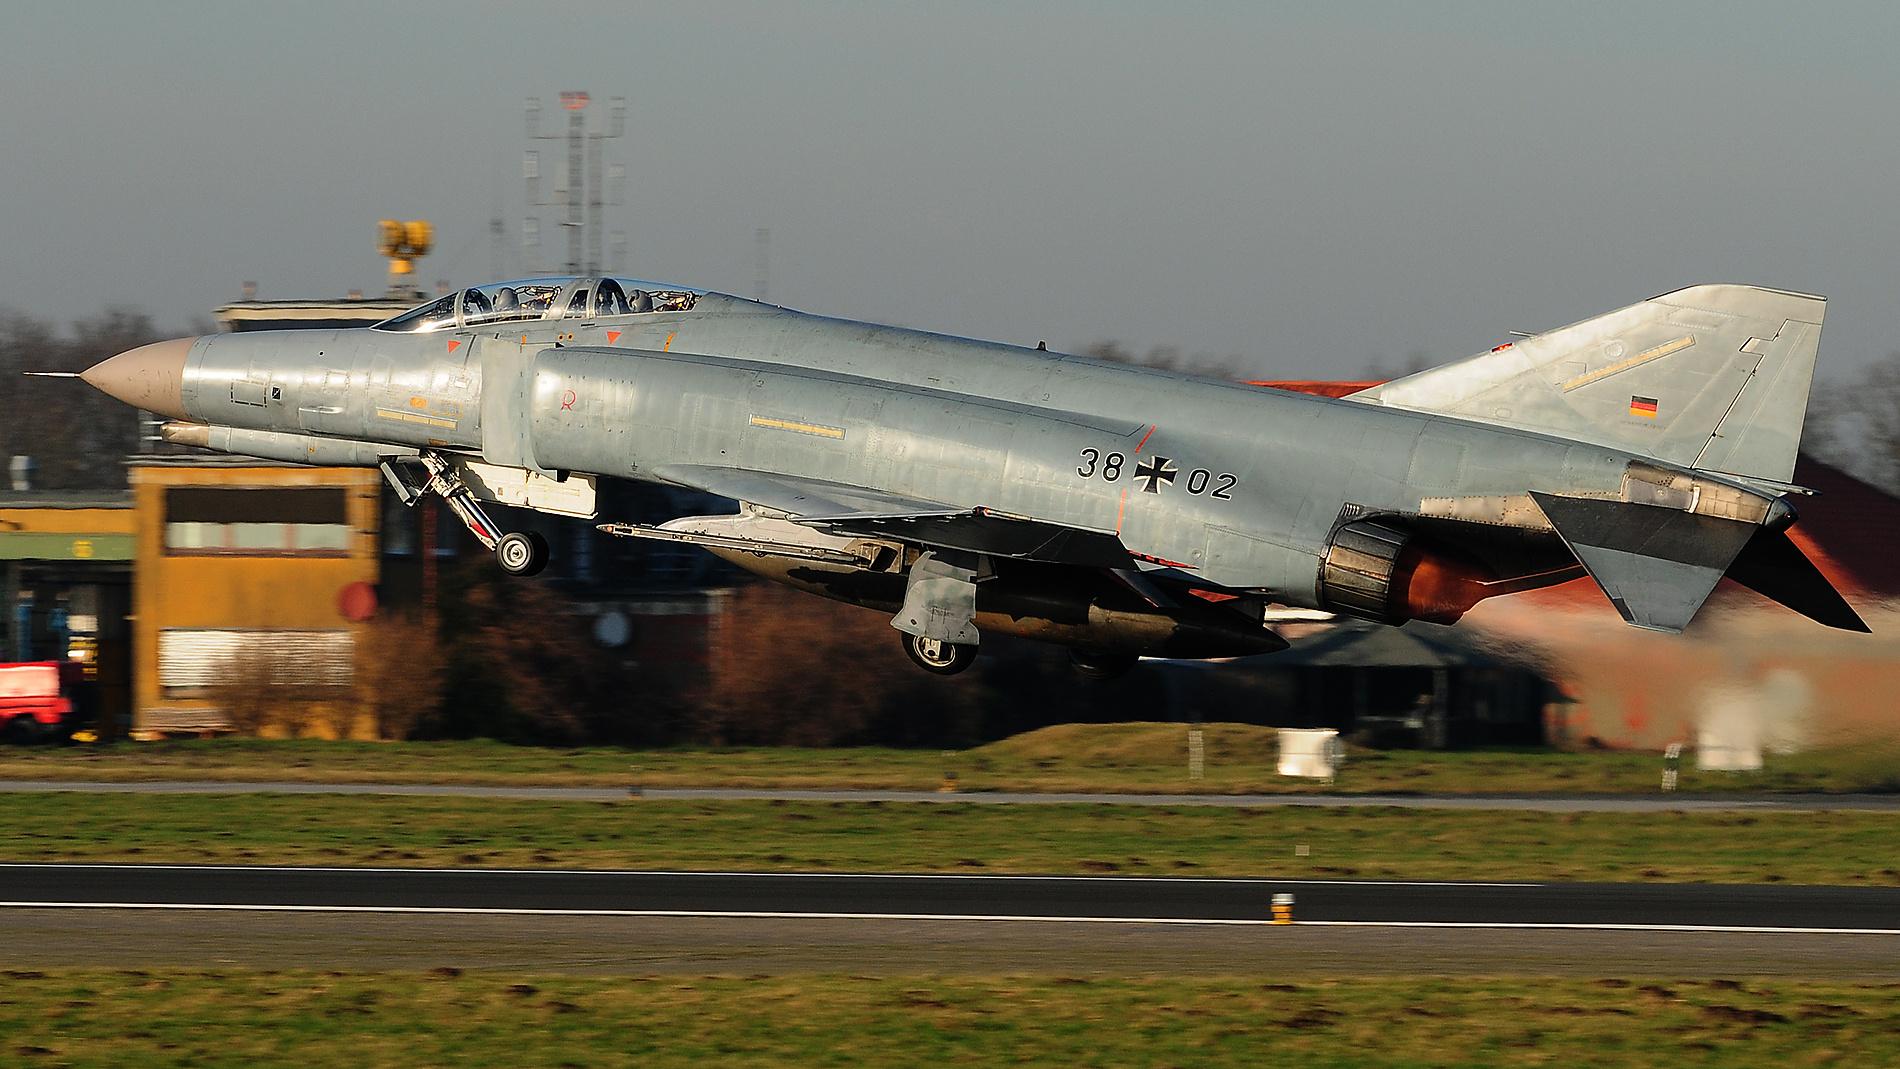 Start F-4F Phantom II 38+02